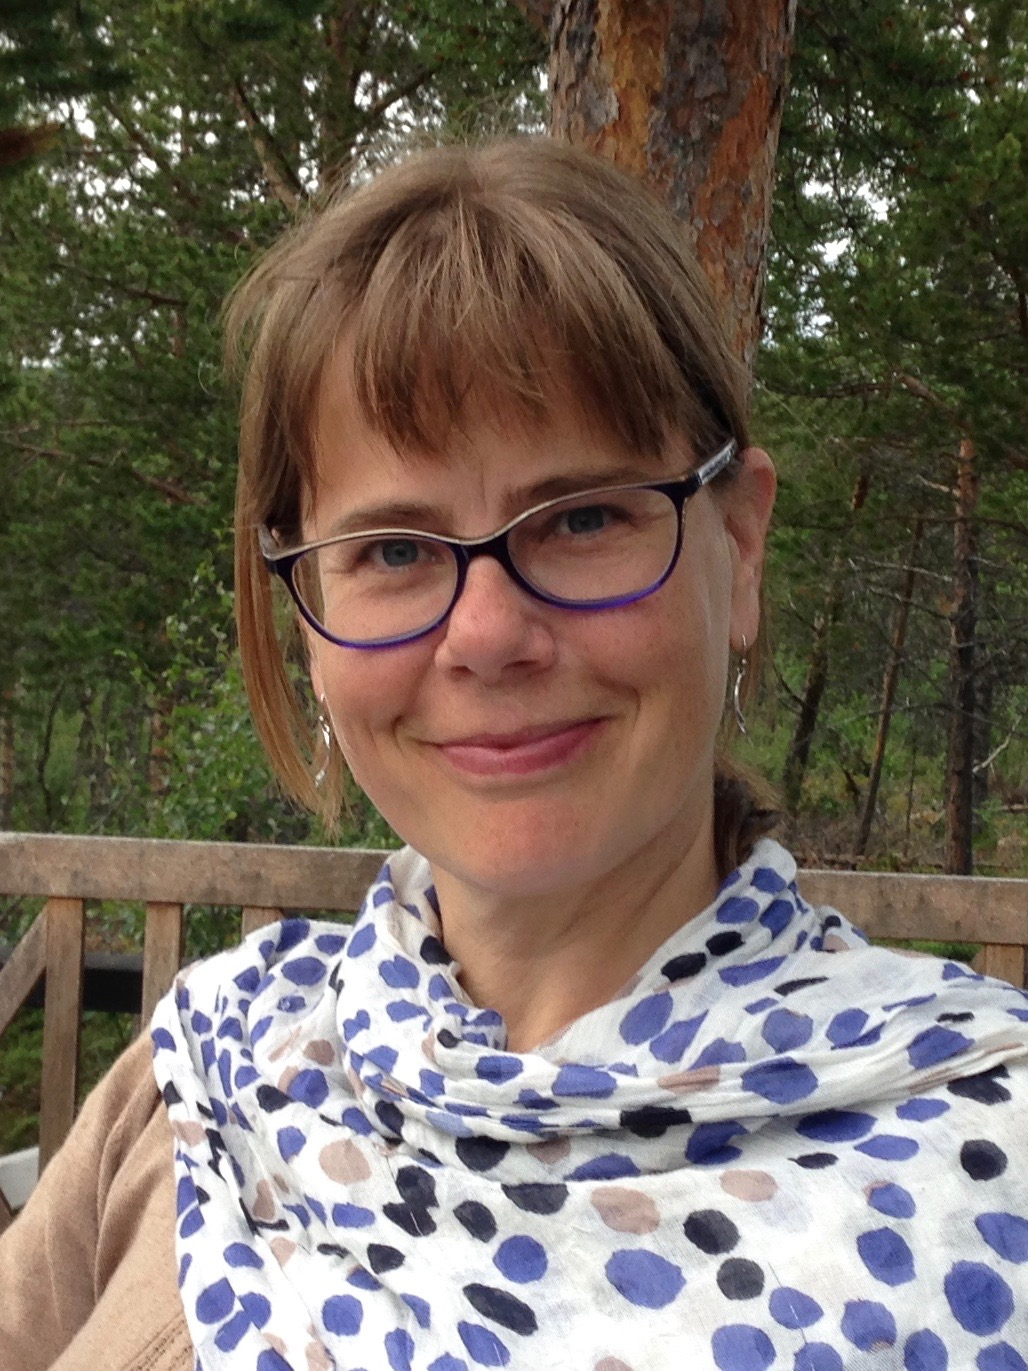 Hanna Slättne - Dramaturg, Facilitator, Theatre Maker